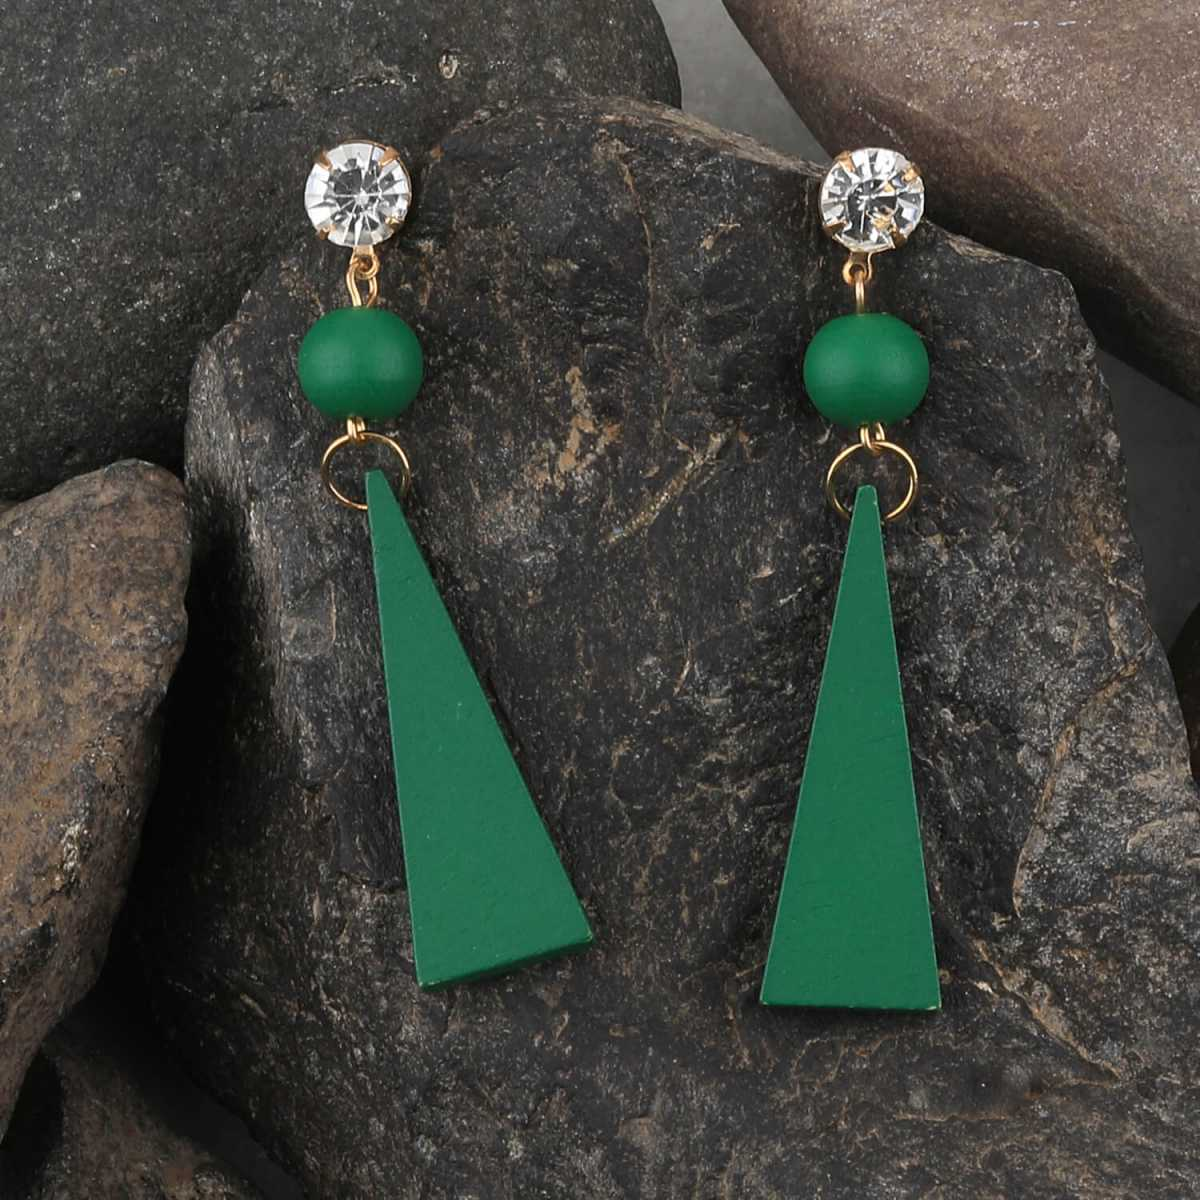 SILVER SHINE Beautiful Stylish Diamond Green Wooden Light Weight Dangler Earrings for Girls and Women.